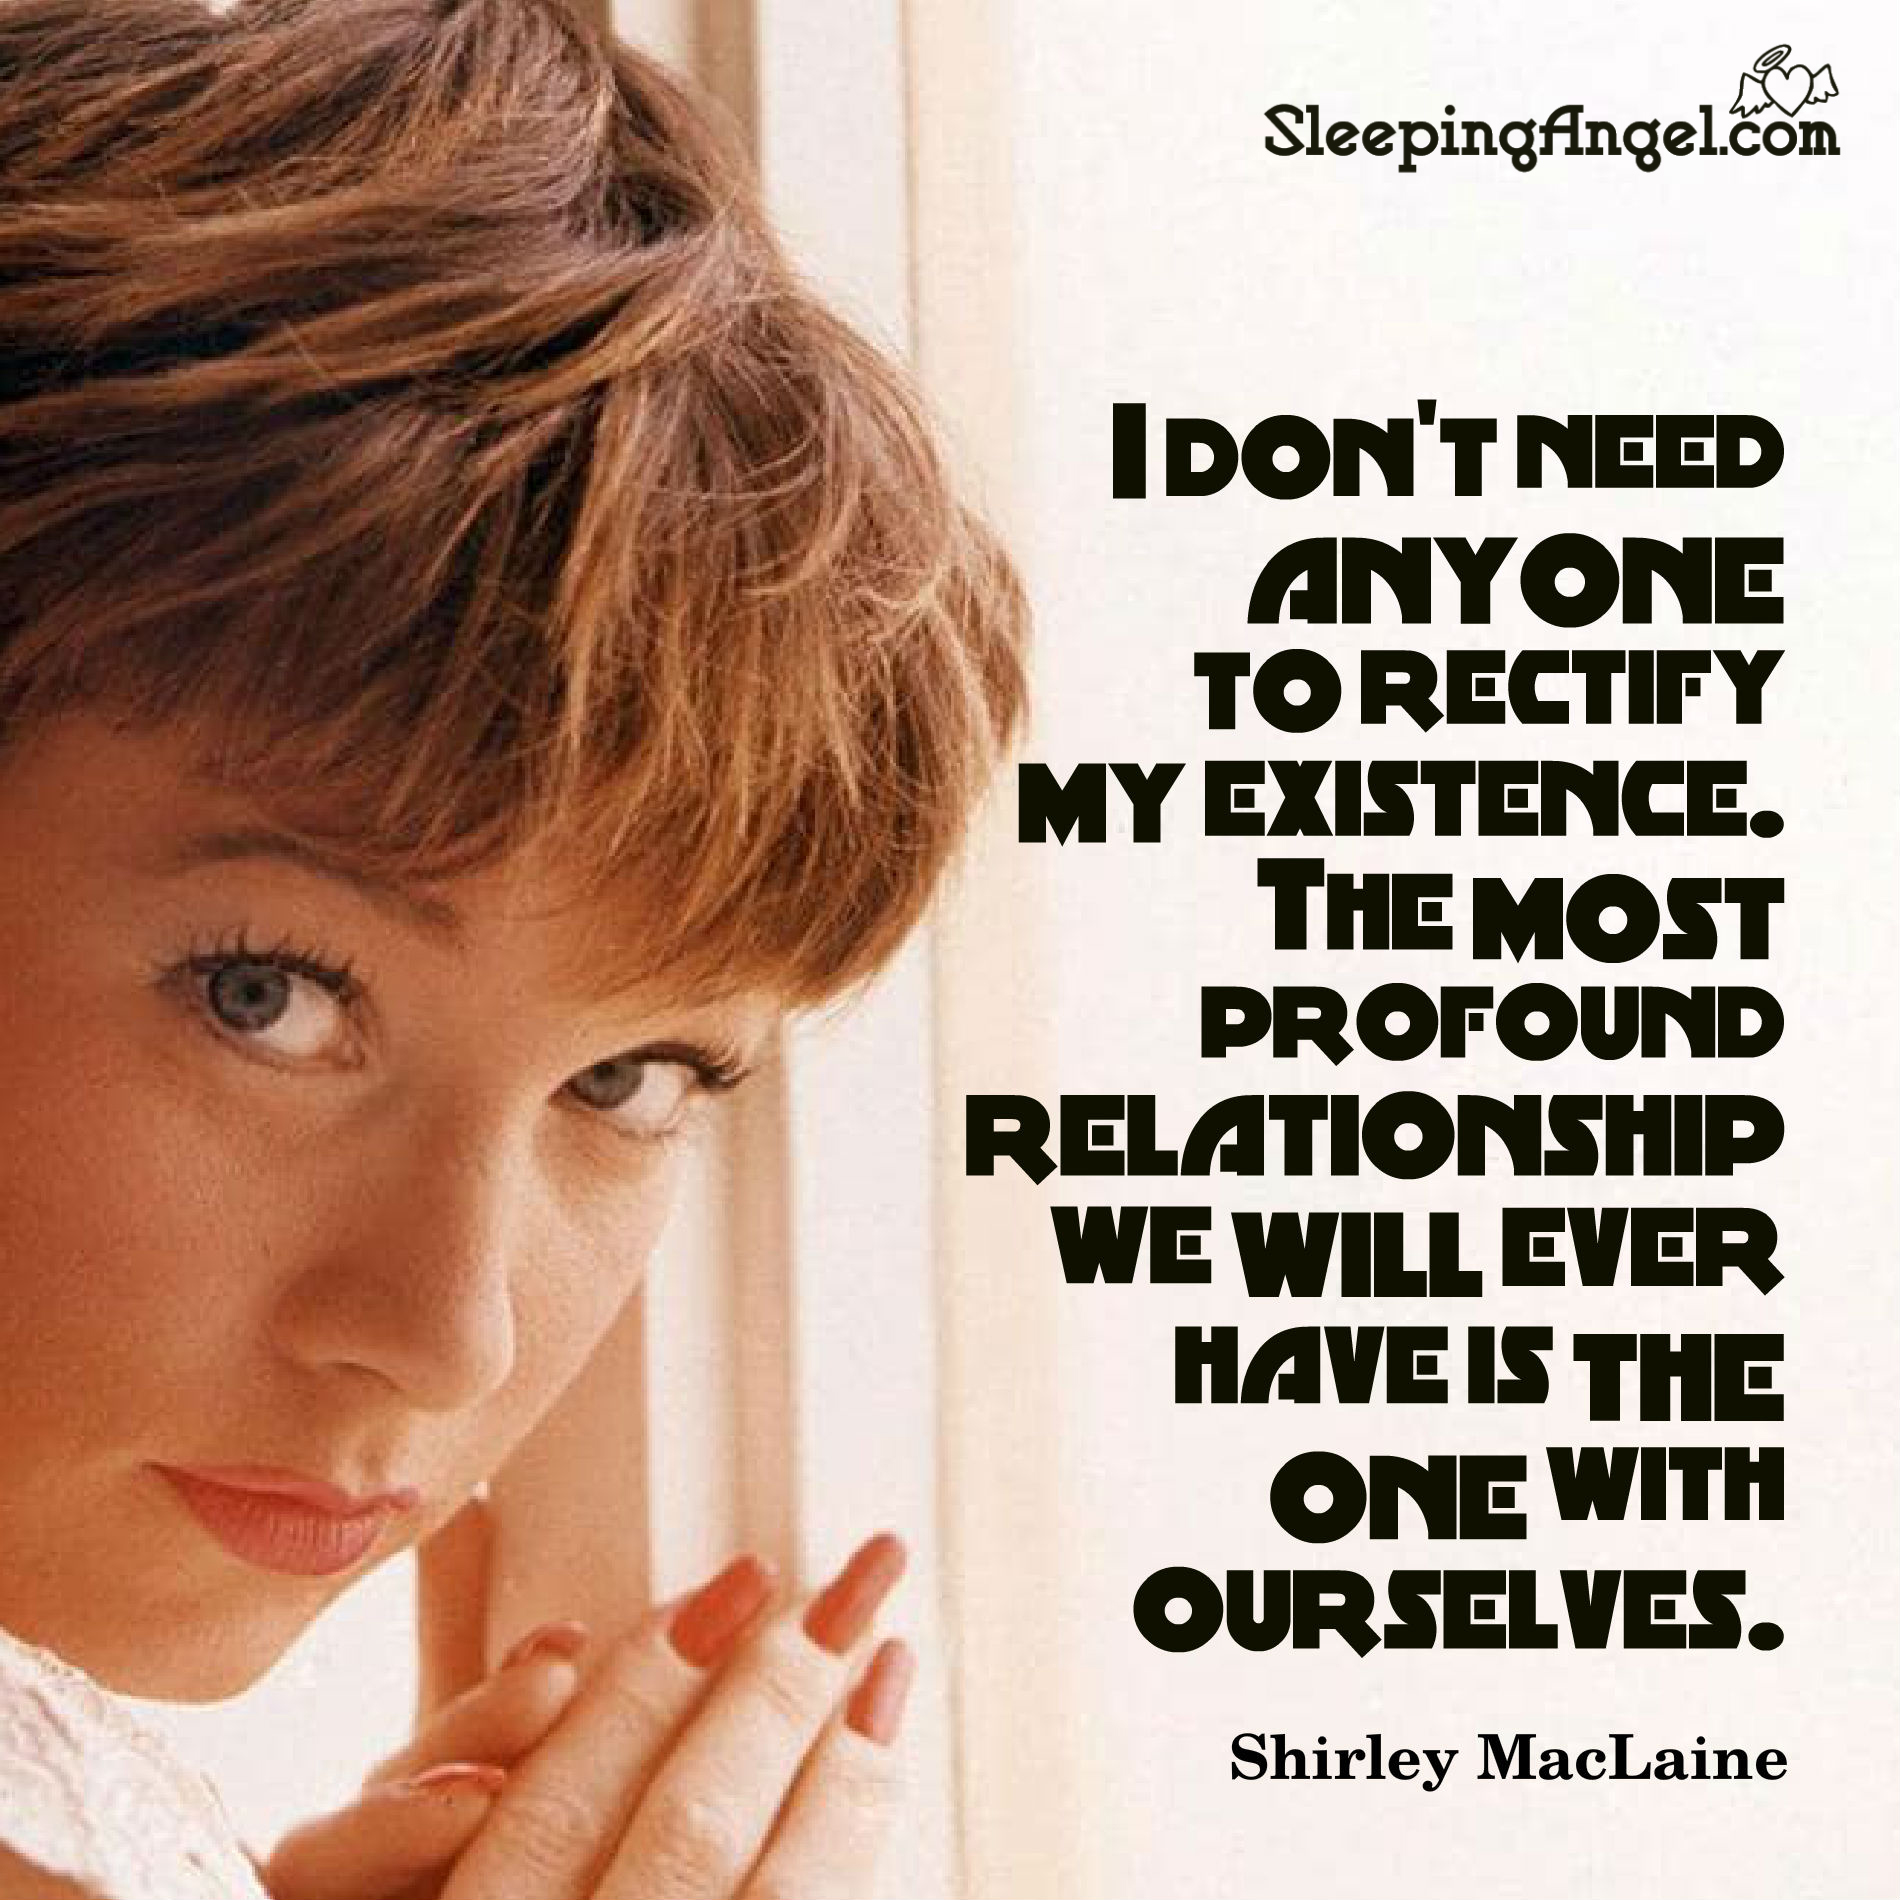 Shirley Maclaine Quote Sleeping Angel